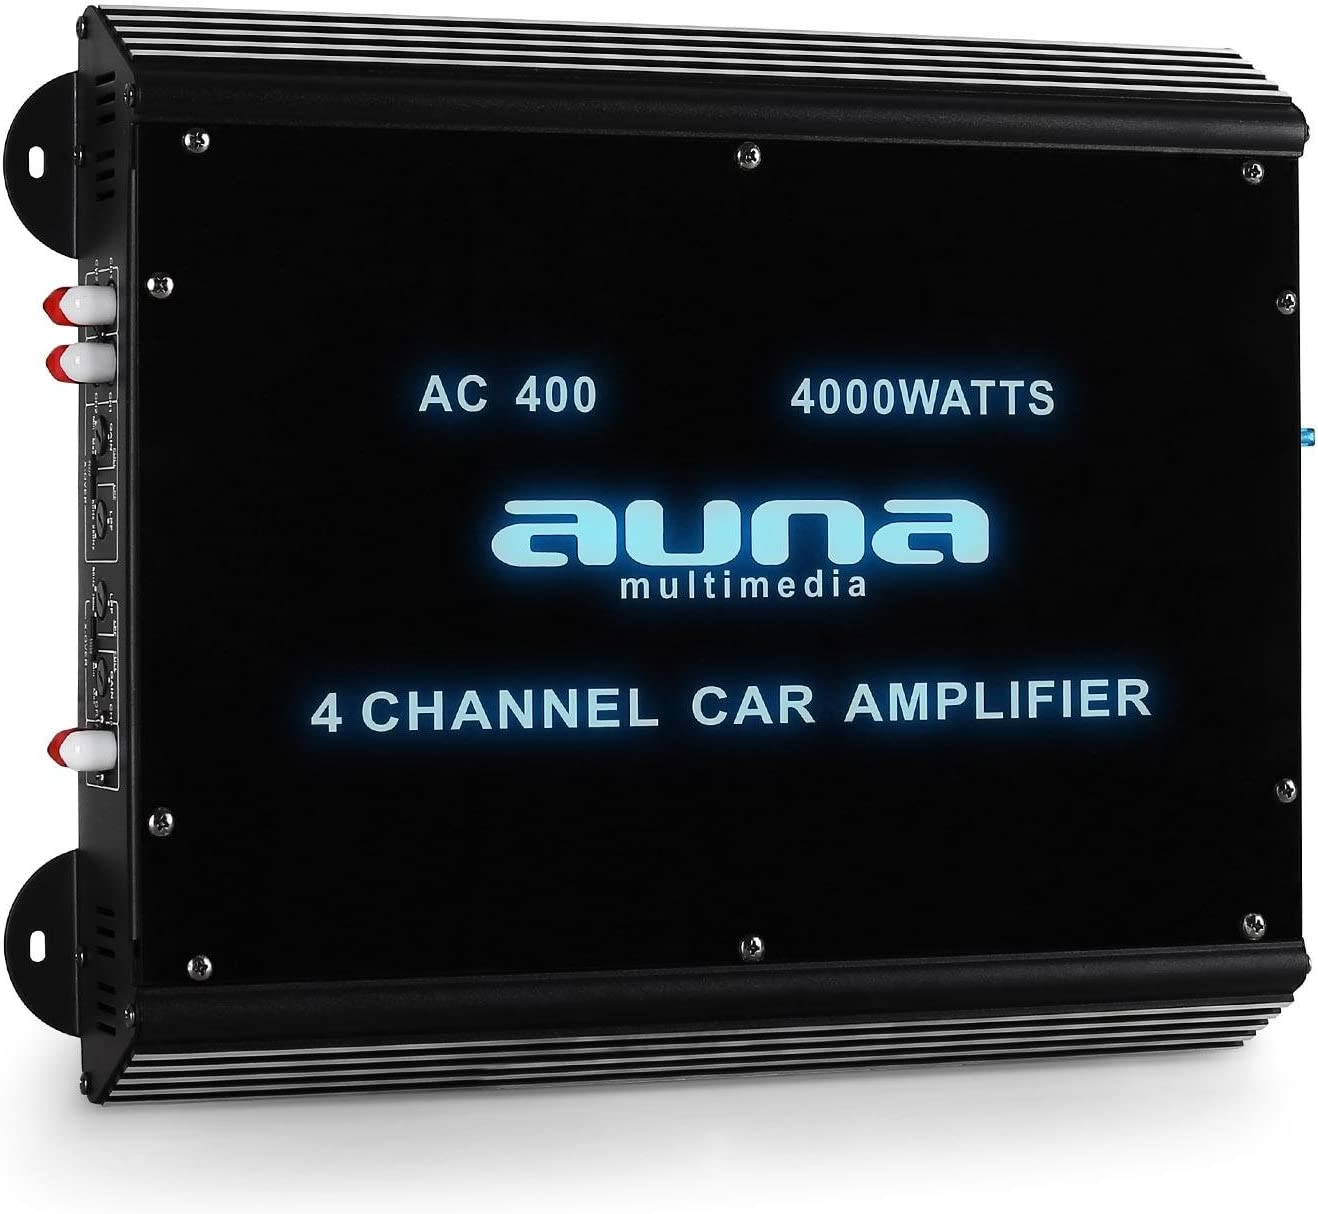 Black//Silver 800W, 1 x Amplifier, 2 x Installation Speakers, 1 x Enclosed Subwoofer, 1 x Cable Set, Built-In Light Effect AUNA FX211 Car HiFi Speaker Amplifier Set